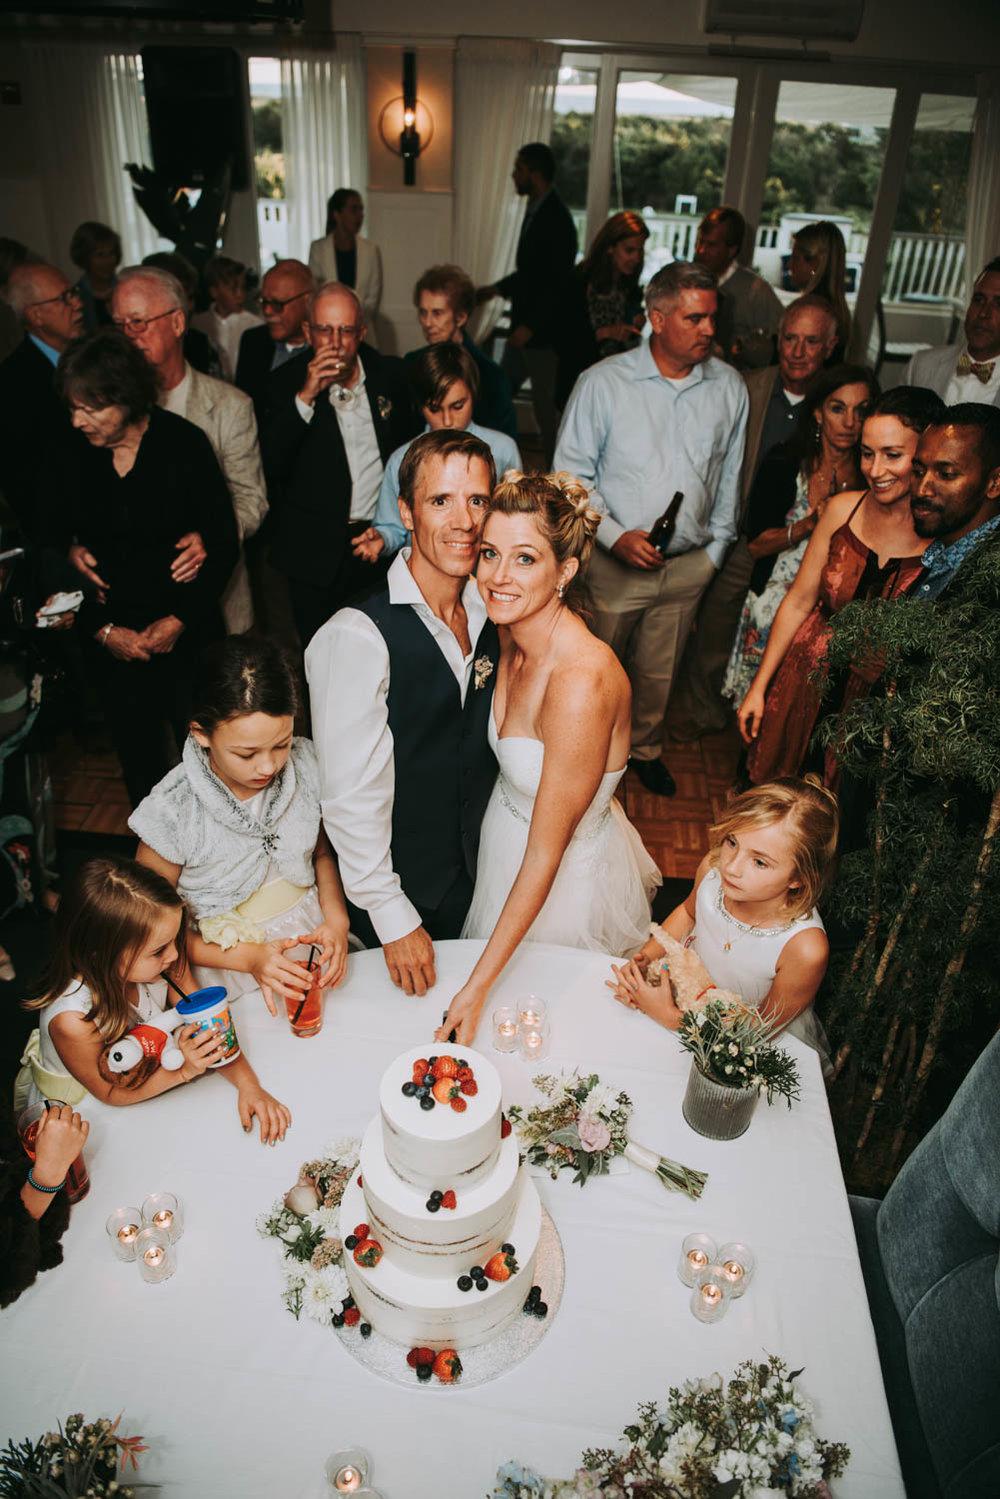 healy-wedding-photography23.jpg